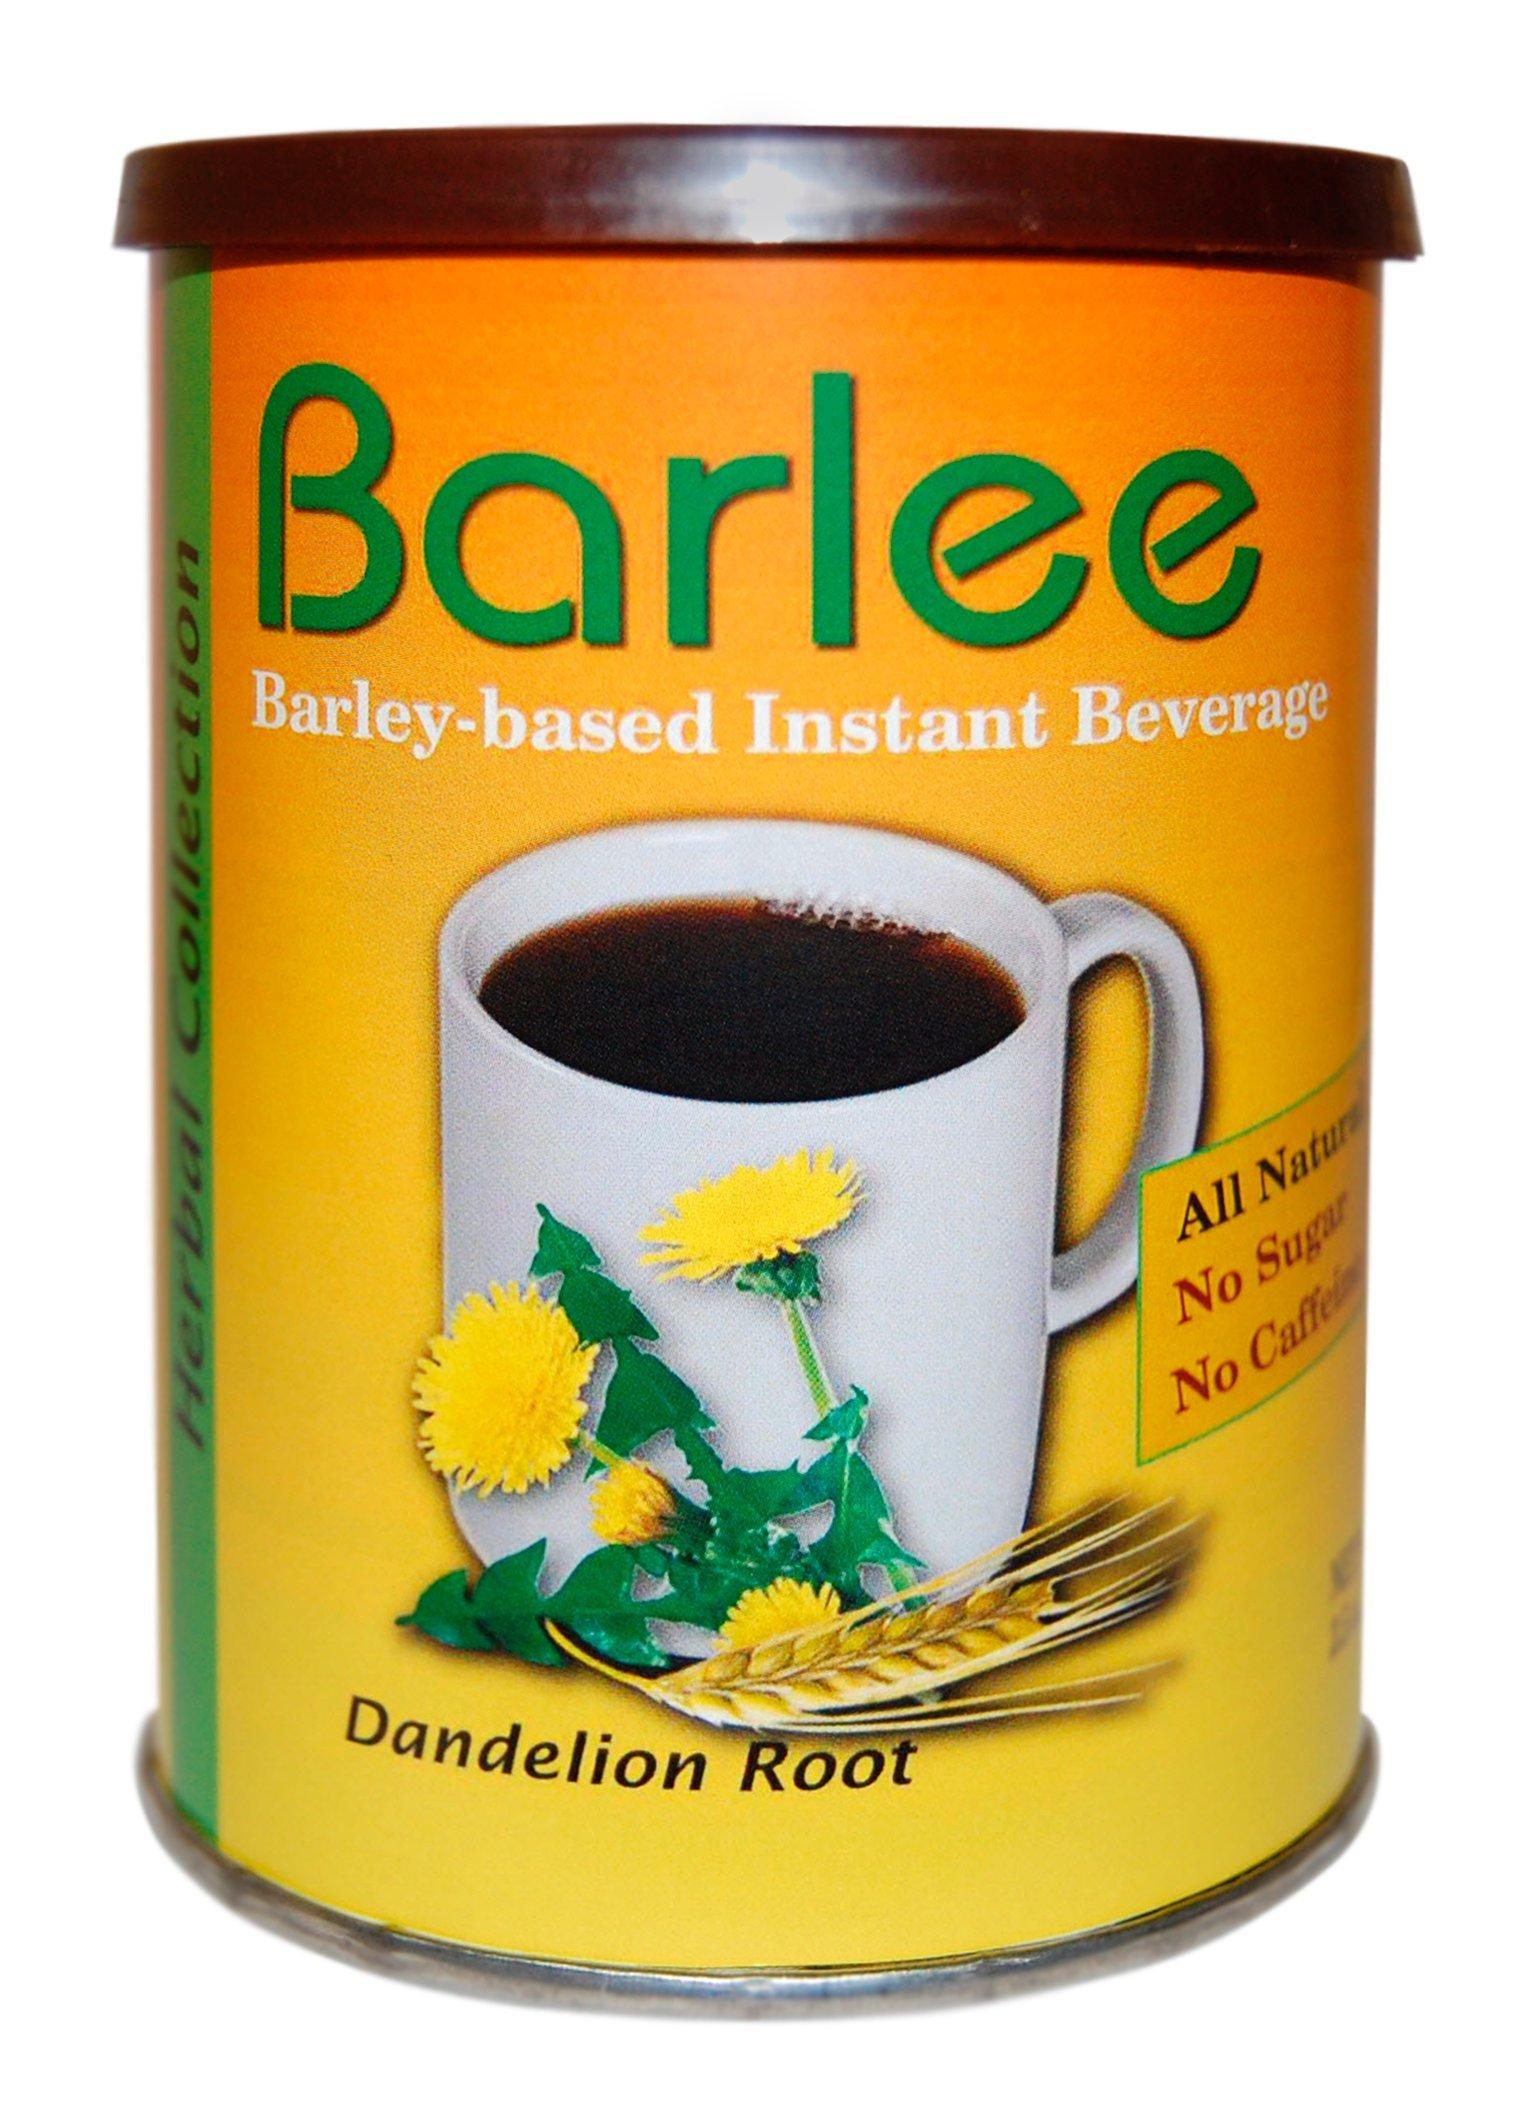 Barlee, with Dandelion, Coffee Substitute, Caffeine Free (3.5 oz)